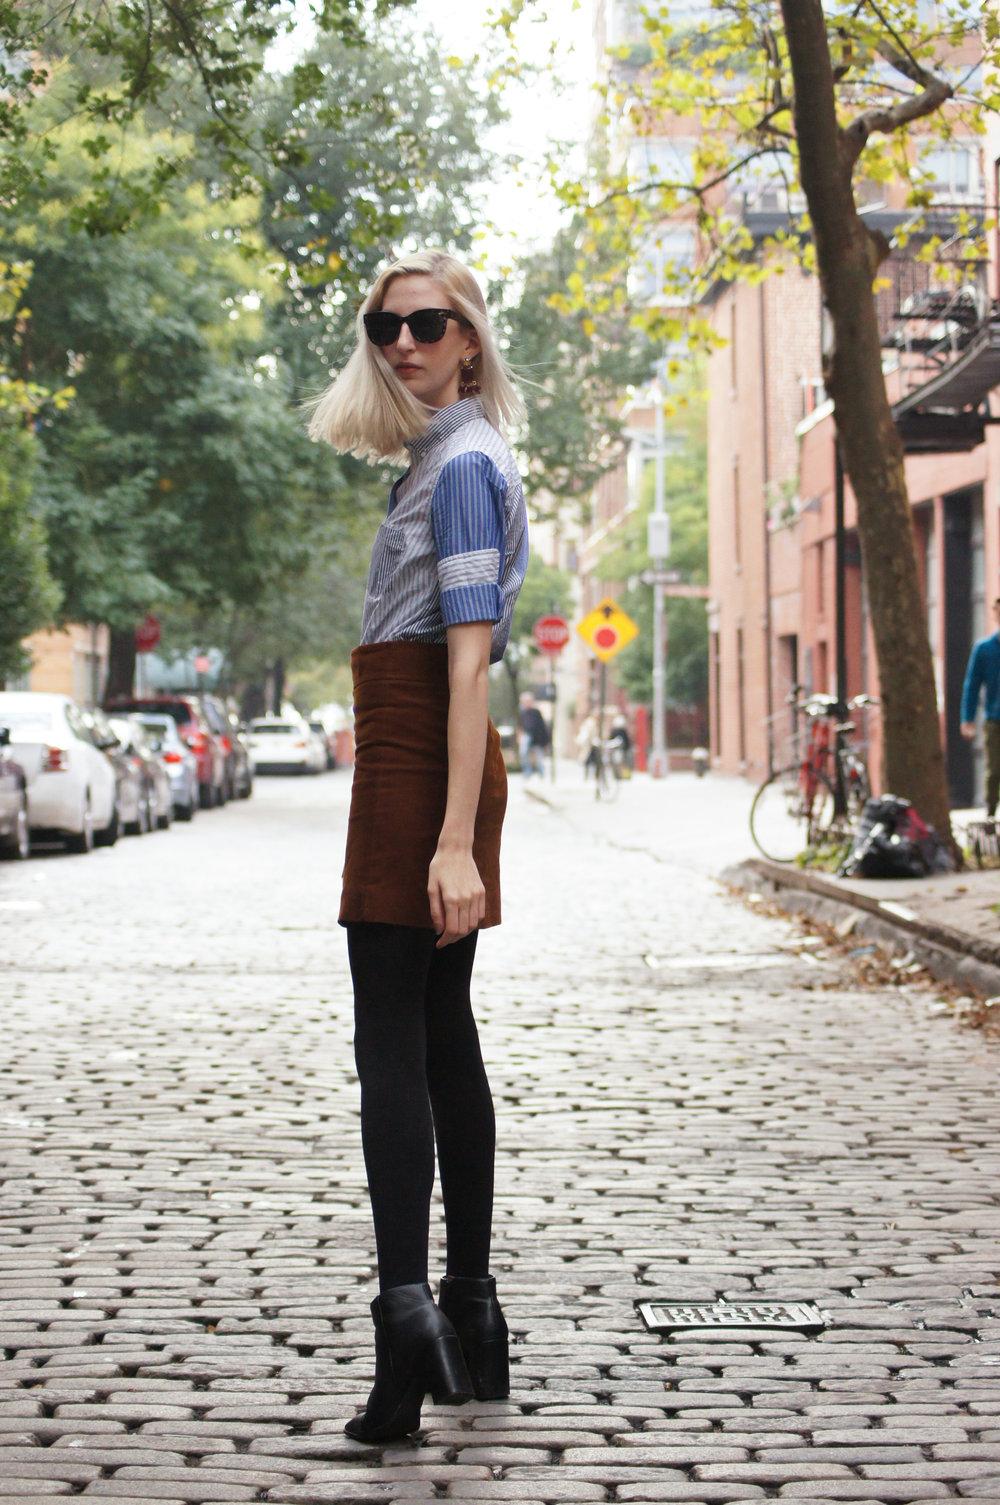 favorite style posts of 2016 - striped cocktail shirt, brown courduroy skirt, black block heel booties